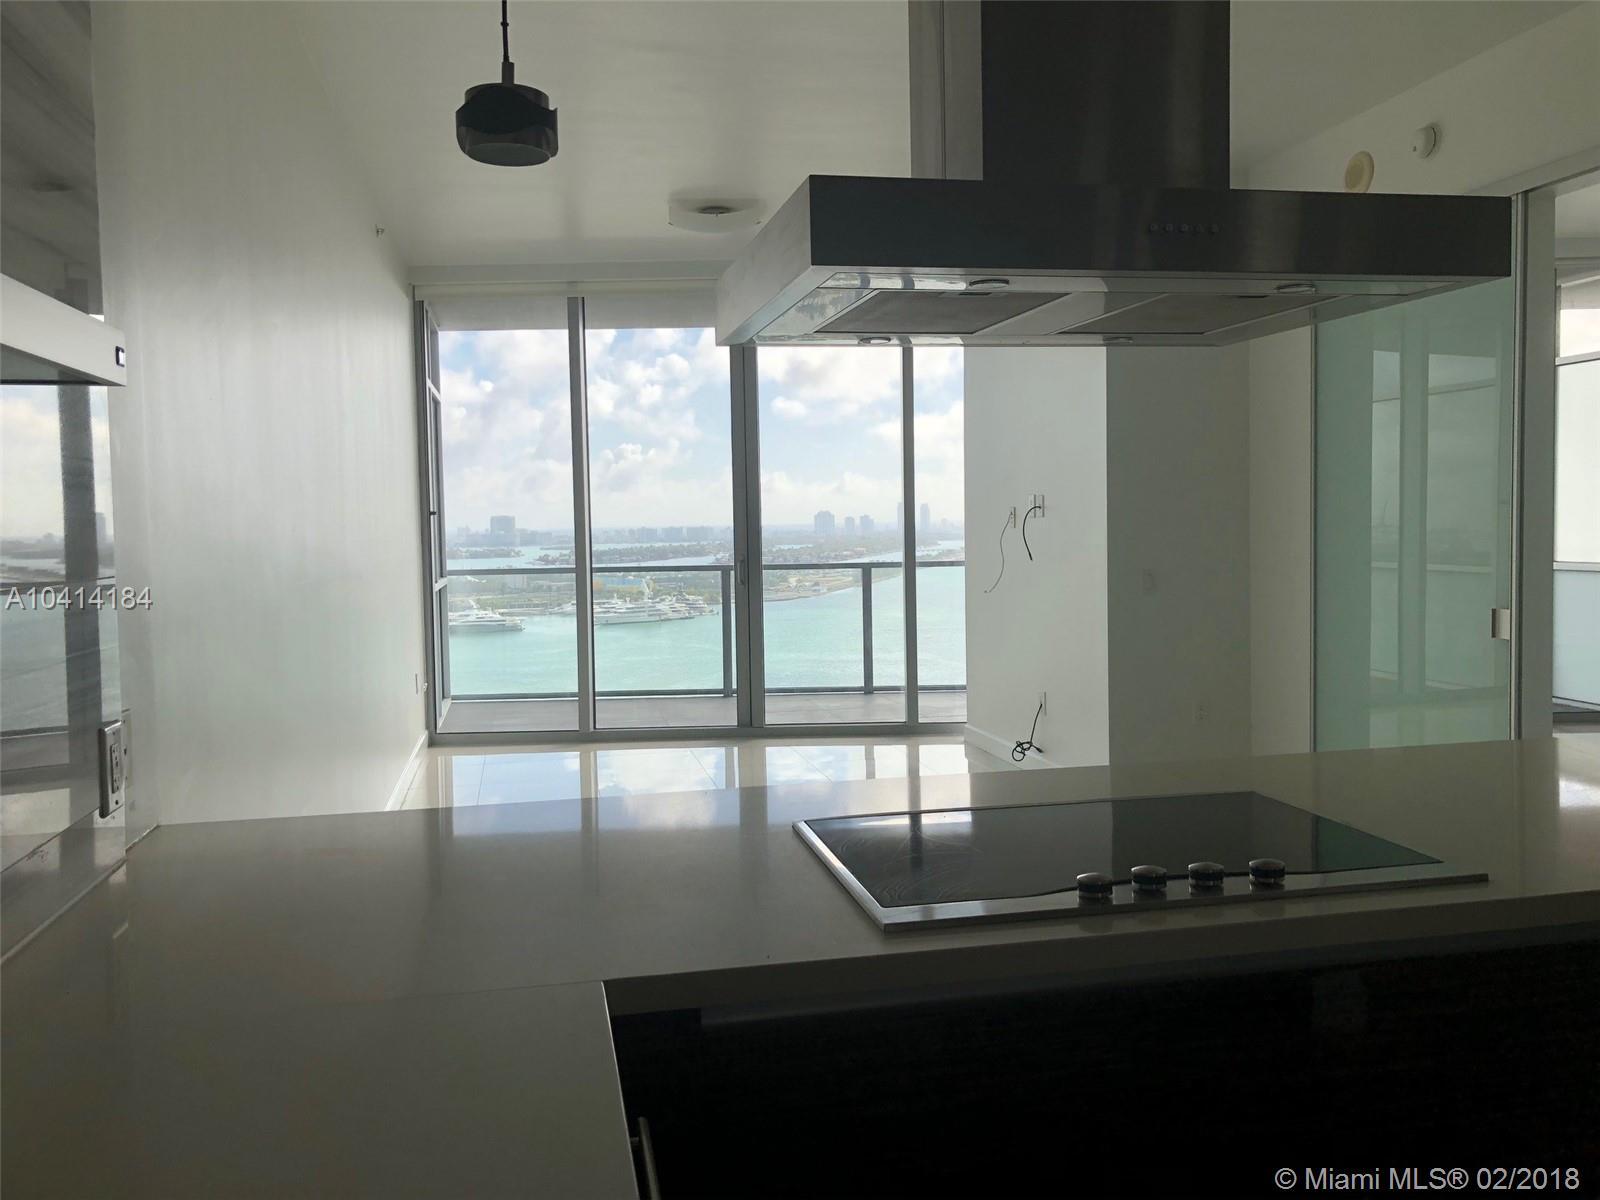 1100 BISCAYNE BL # 2503, Miami , FL 33132